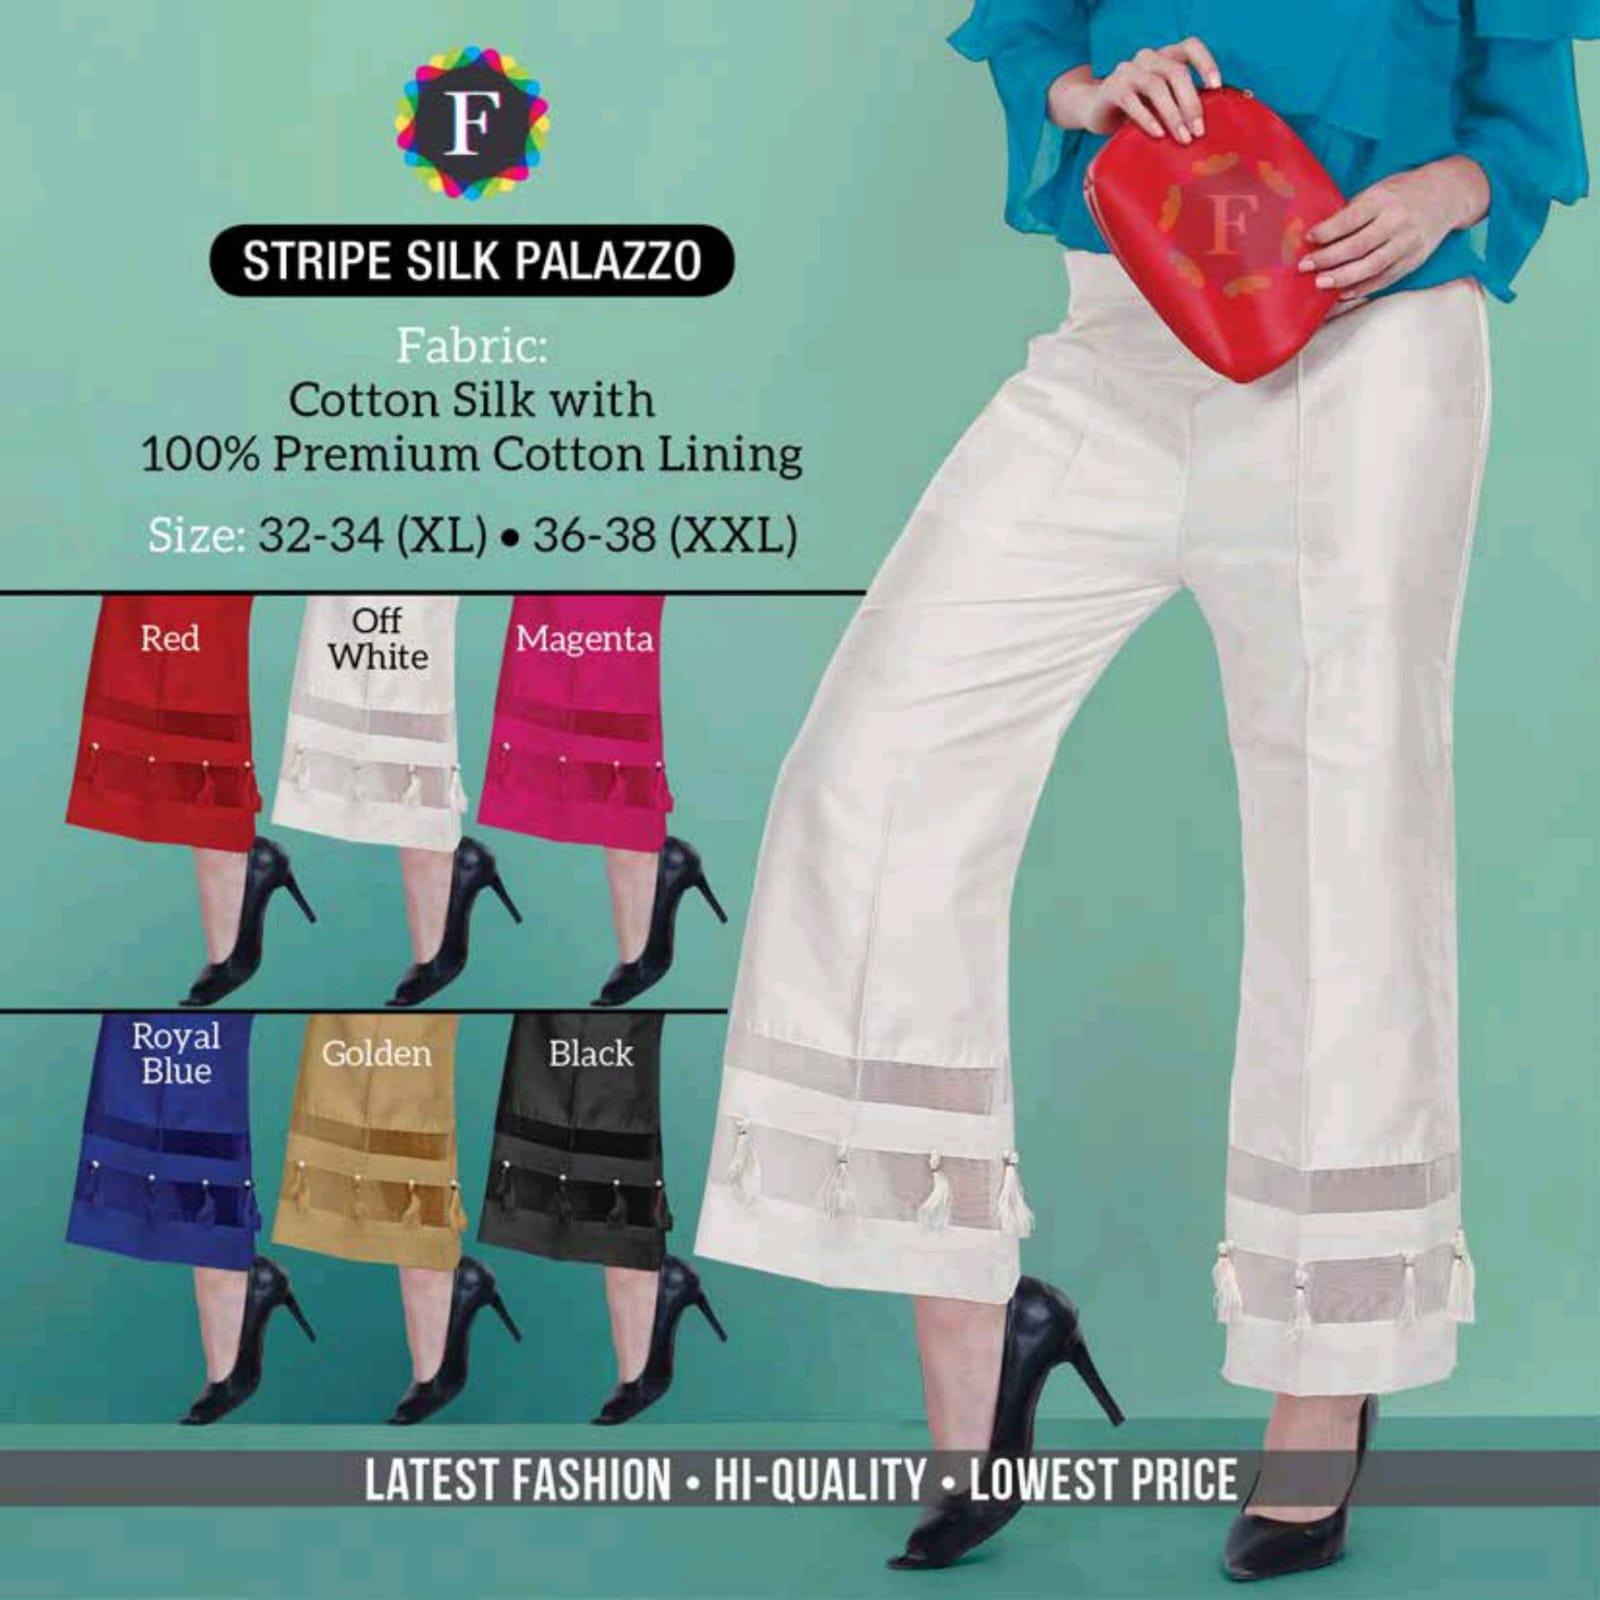 Buy Palazzo Online Foil Palazzo Layered Palazo Stripe Silk Palazzo Printed Palazzo At Cheapest Rates